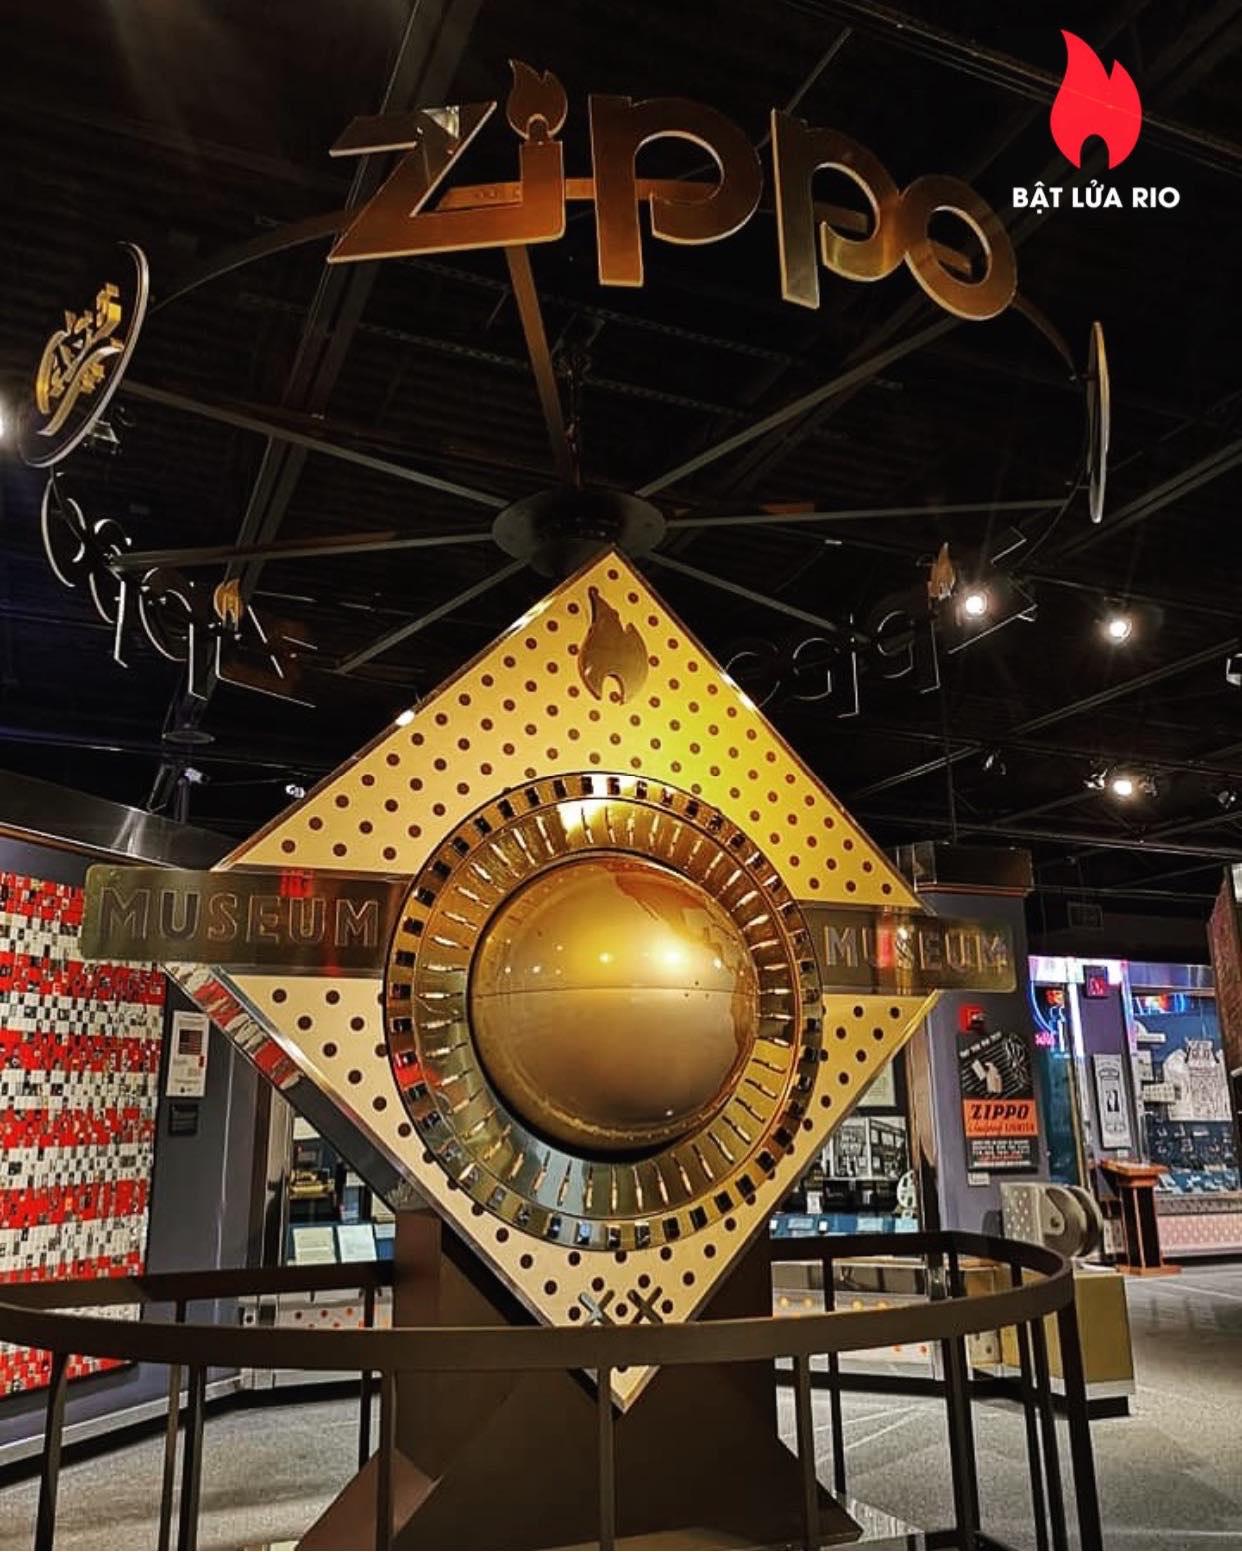 THAM QUAN BẢO TÀNG ZIPPO/CASE - ZIPPO/CASE MUSEUM 84